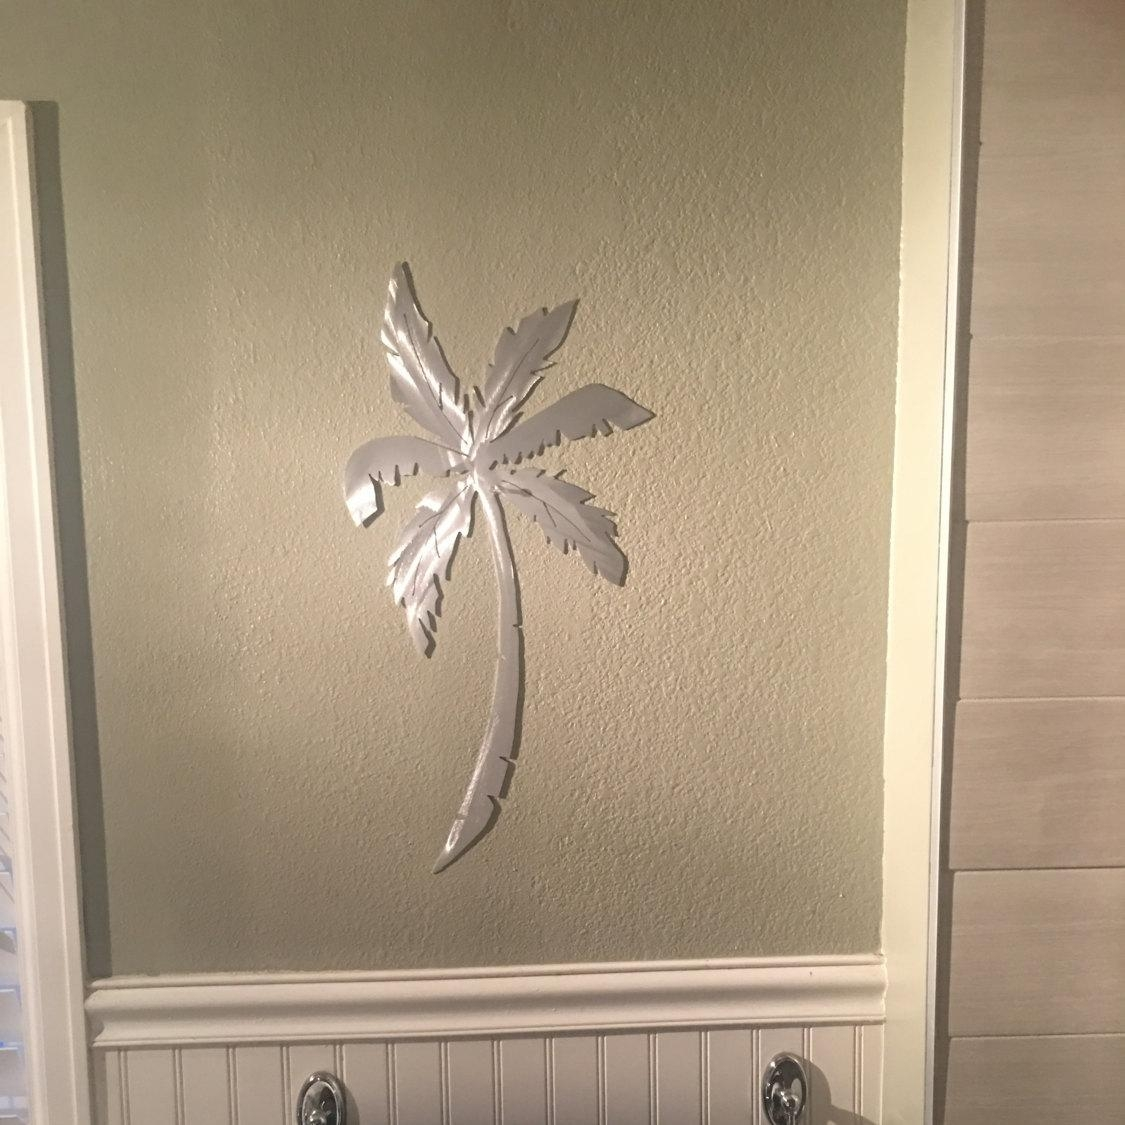 Palm Leaf Wall Decor, Tropical Plants, Metal Wall Art, Outdoor Within Palm Leaf Wall Decor (Image 13 of 20)